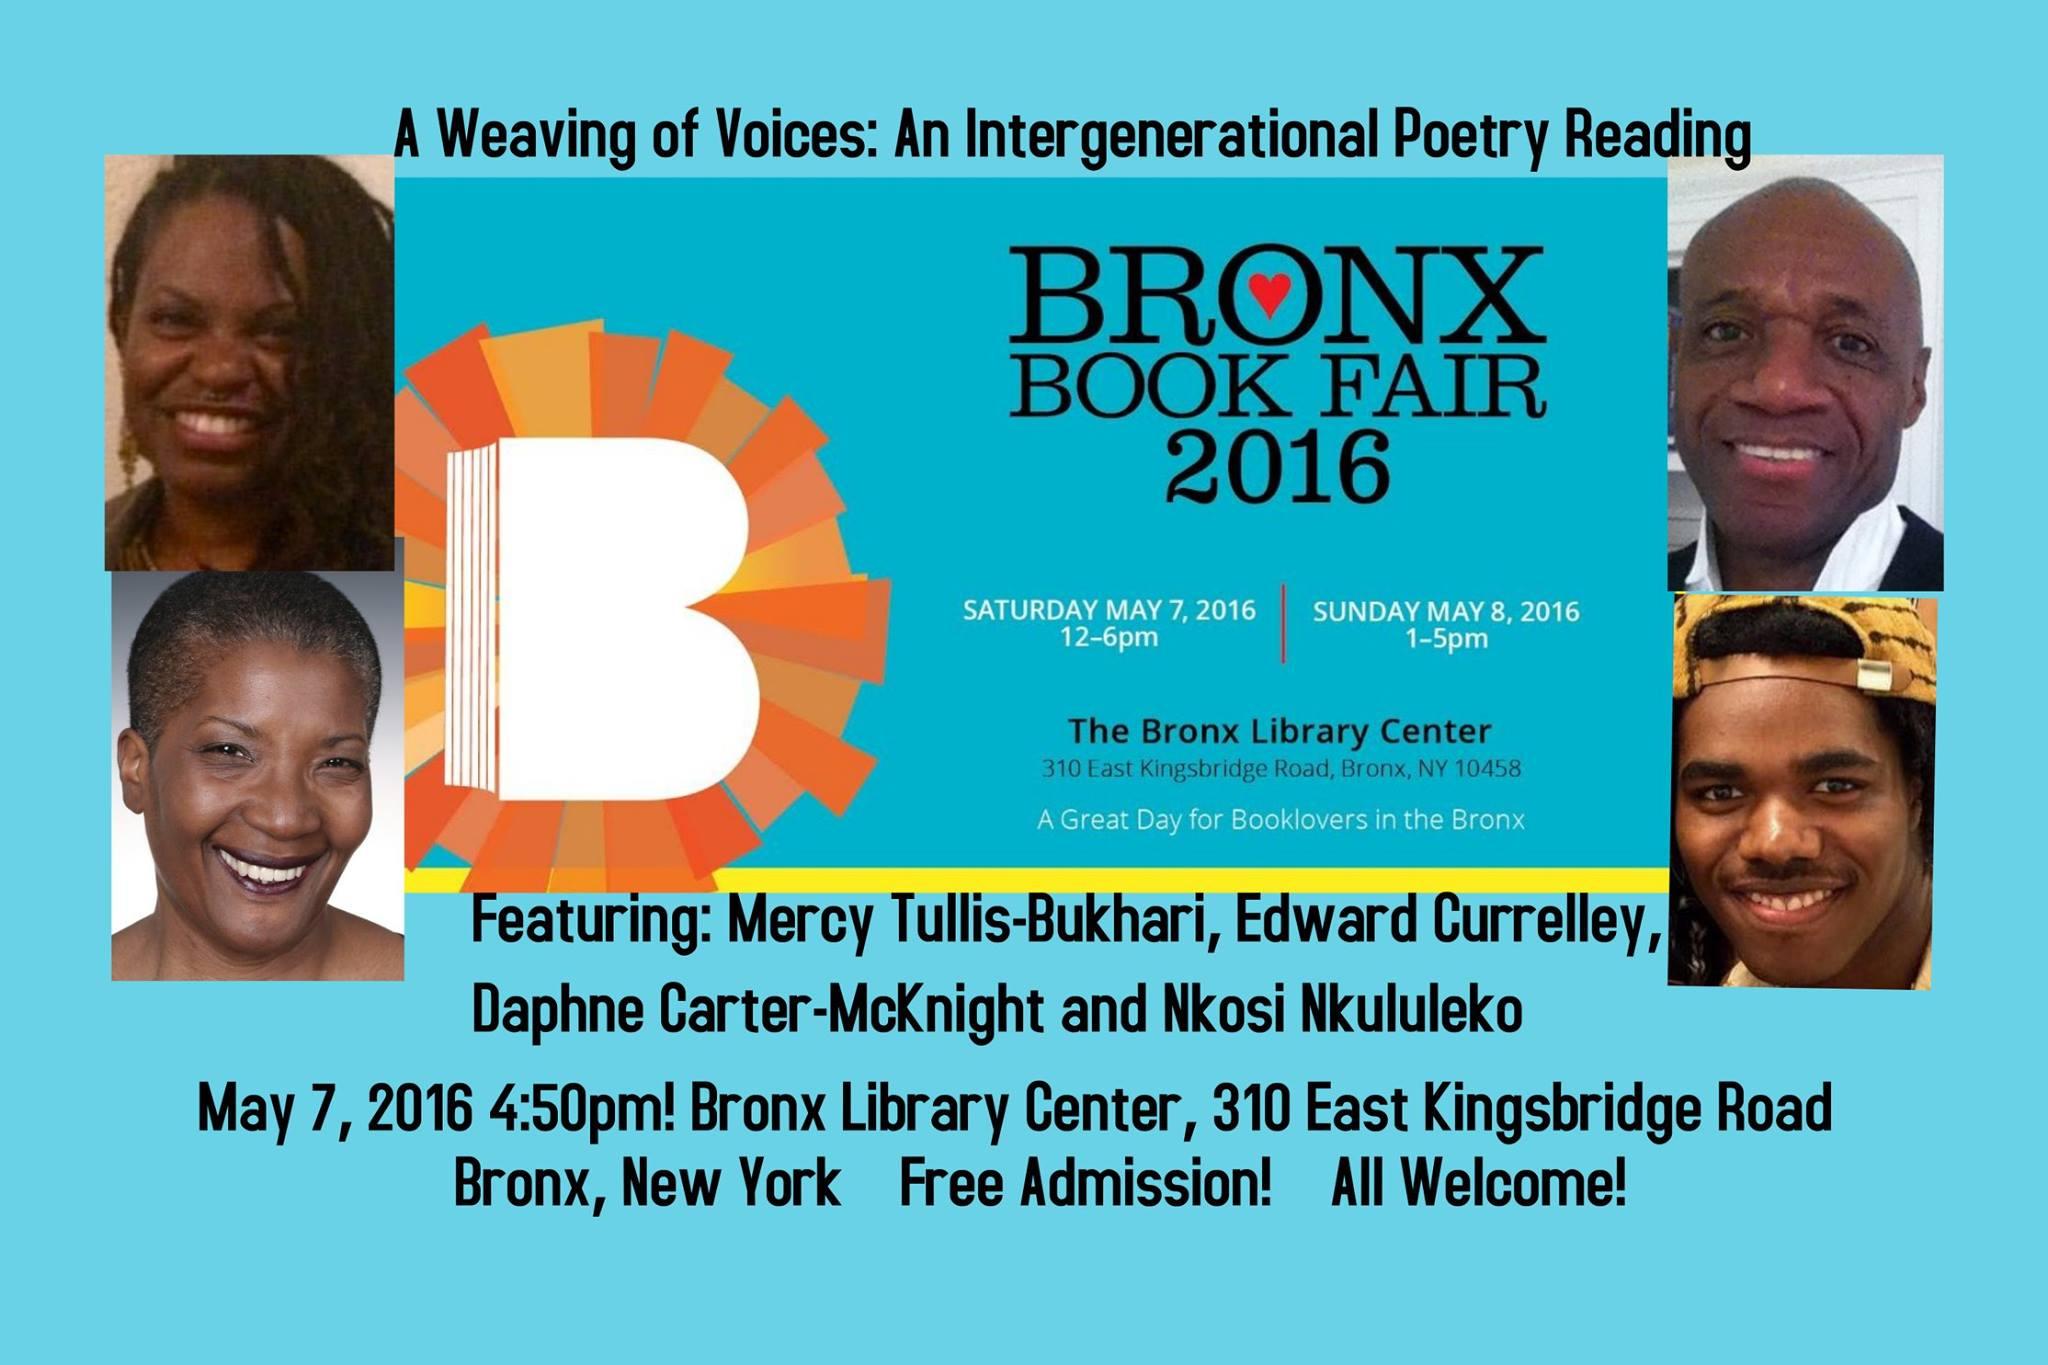 Bronx Brook Fair 2016